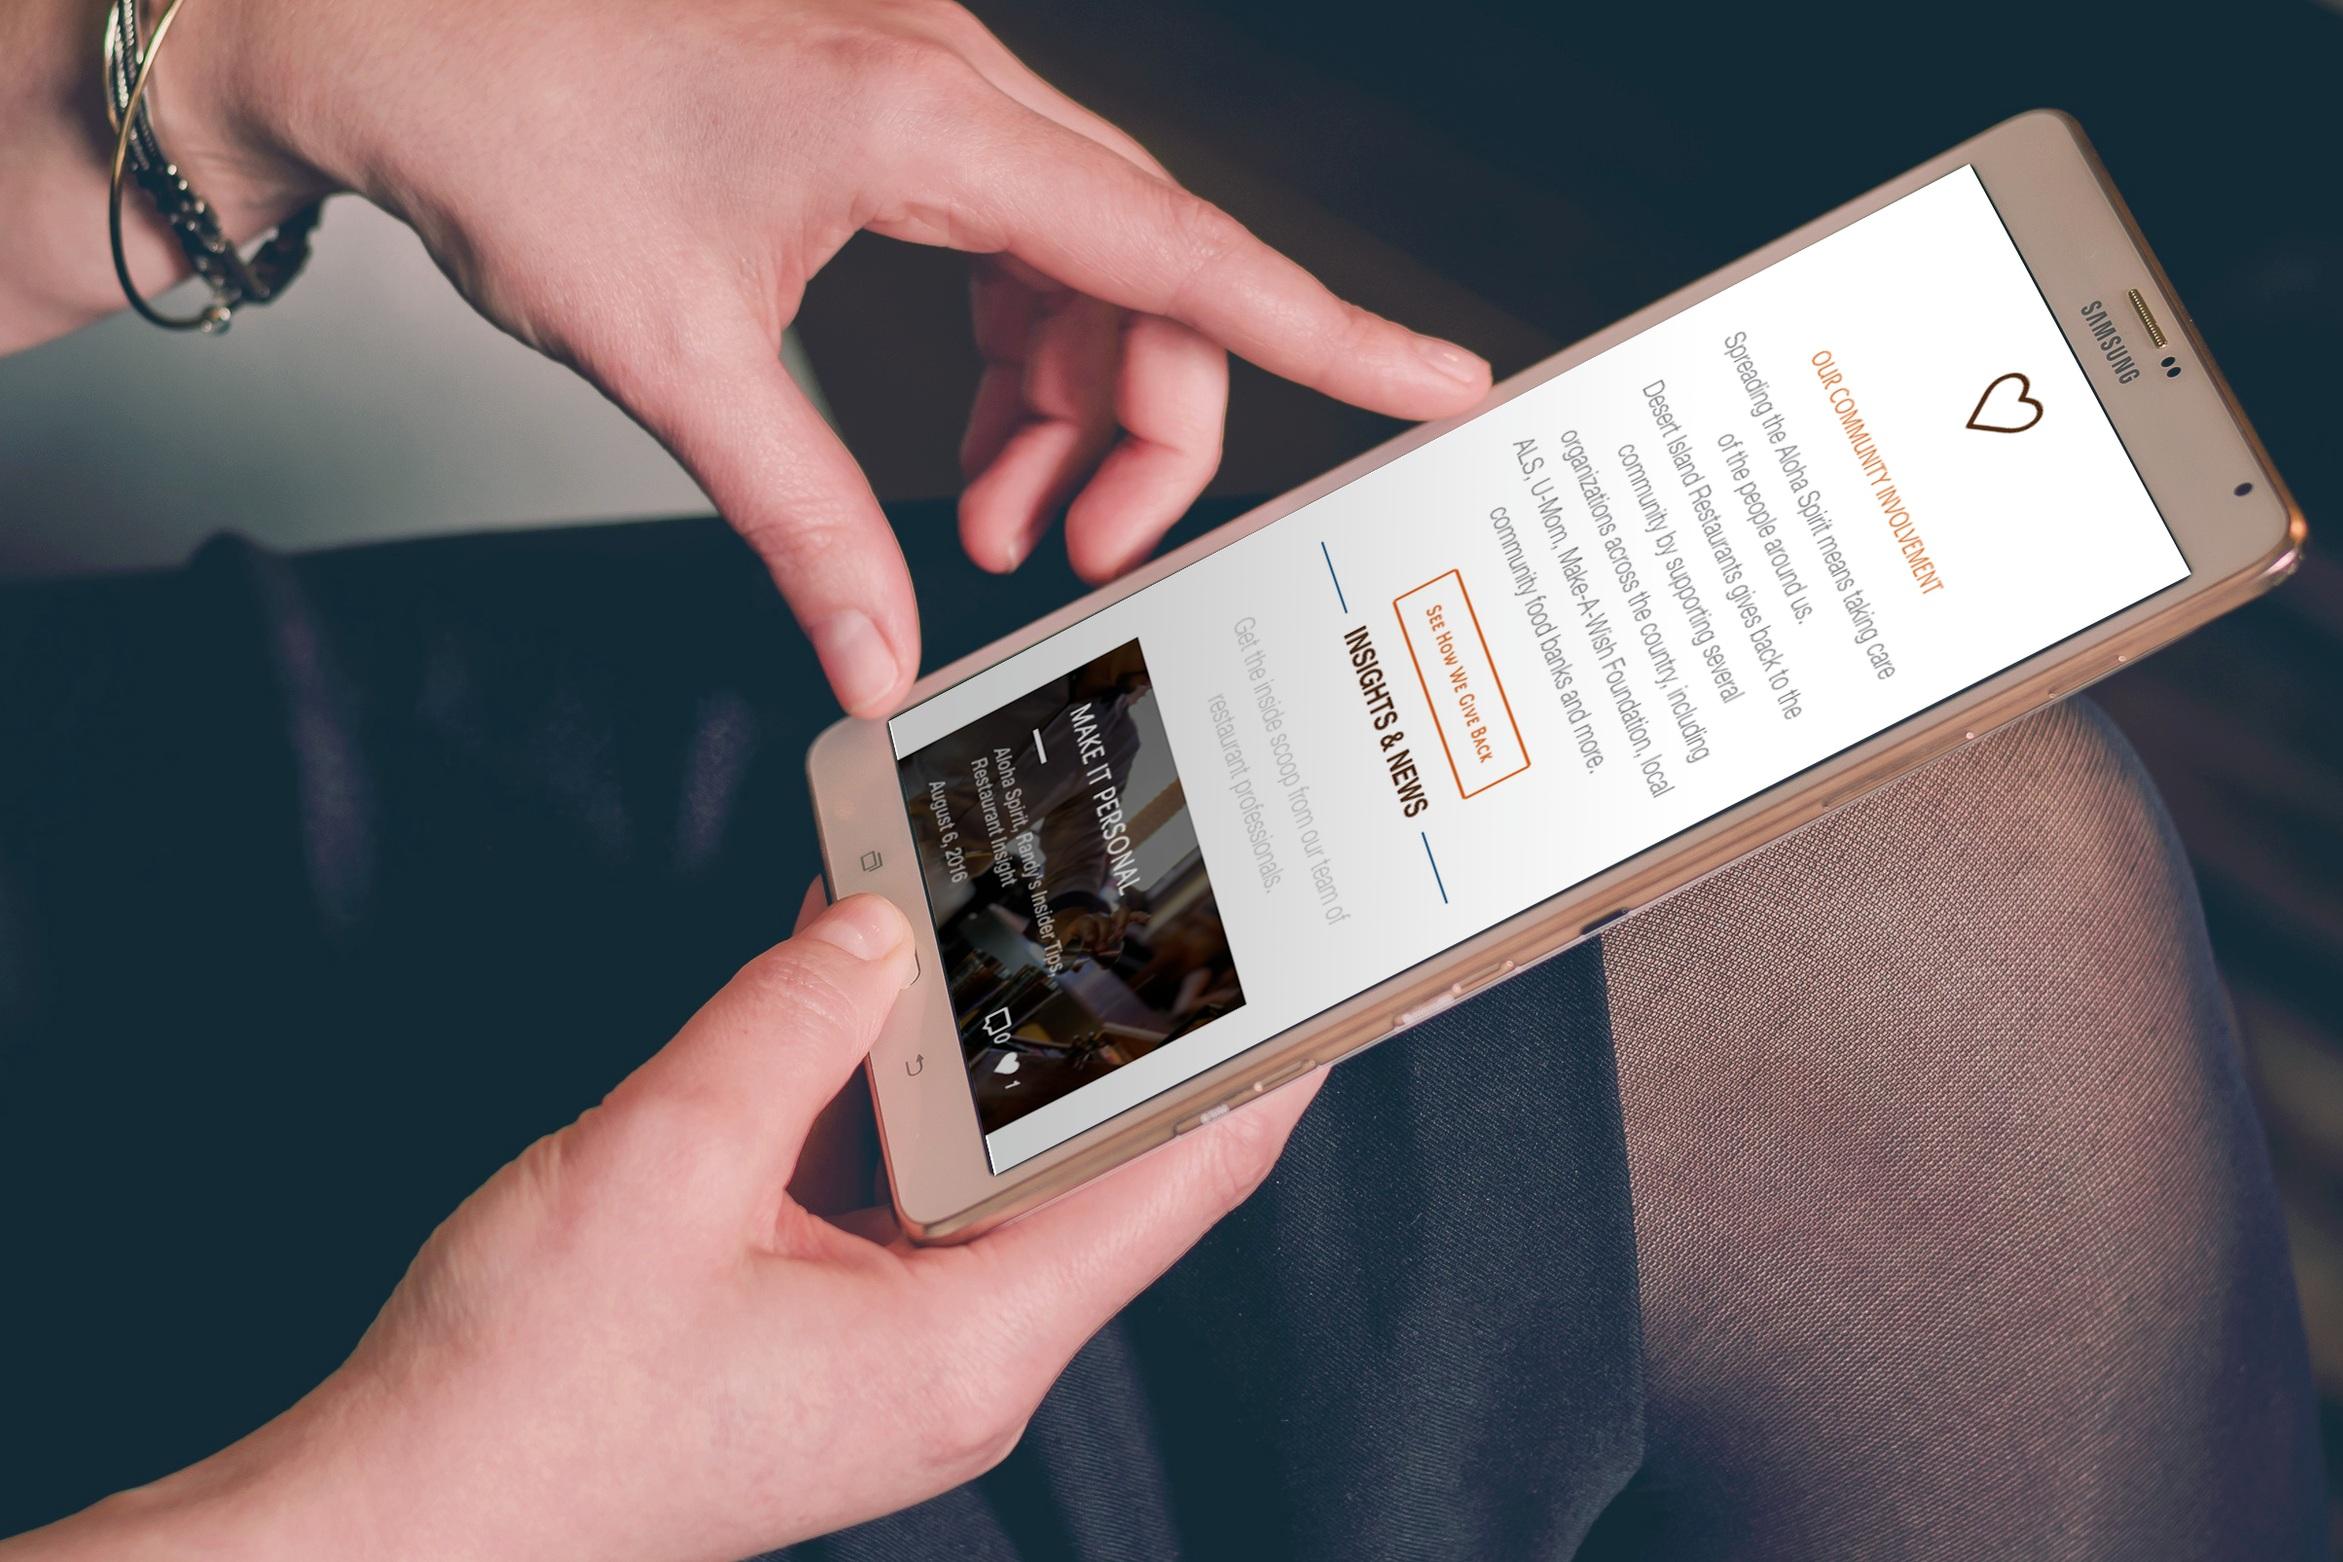 Desert Island Restaurants - Creating an appetizing new website for a national restaurant group